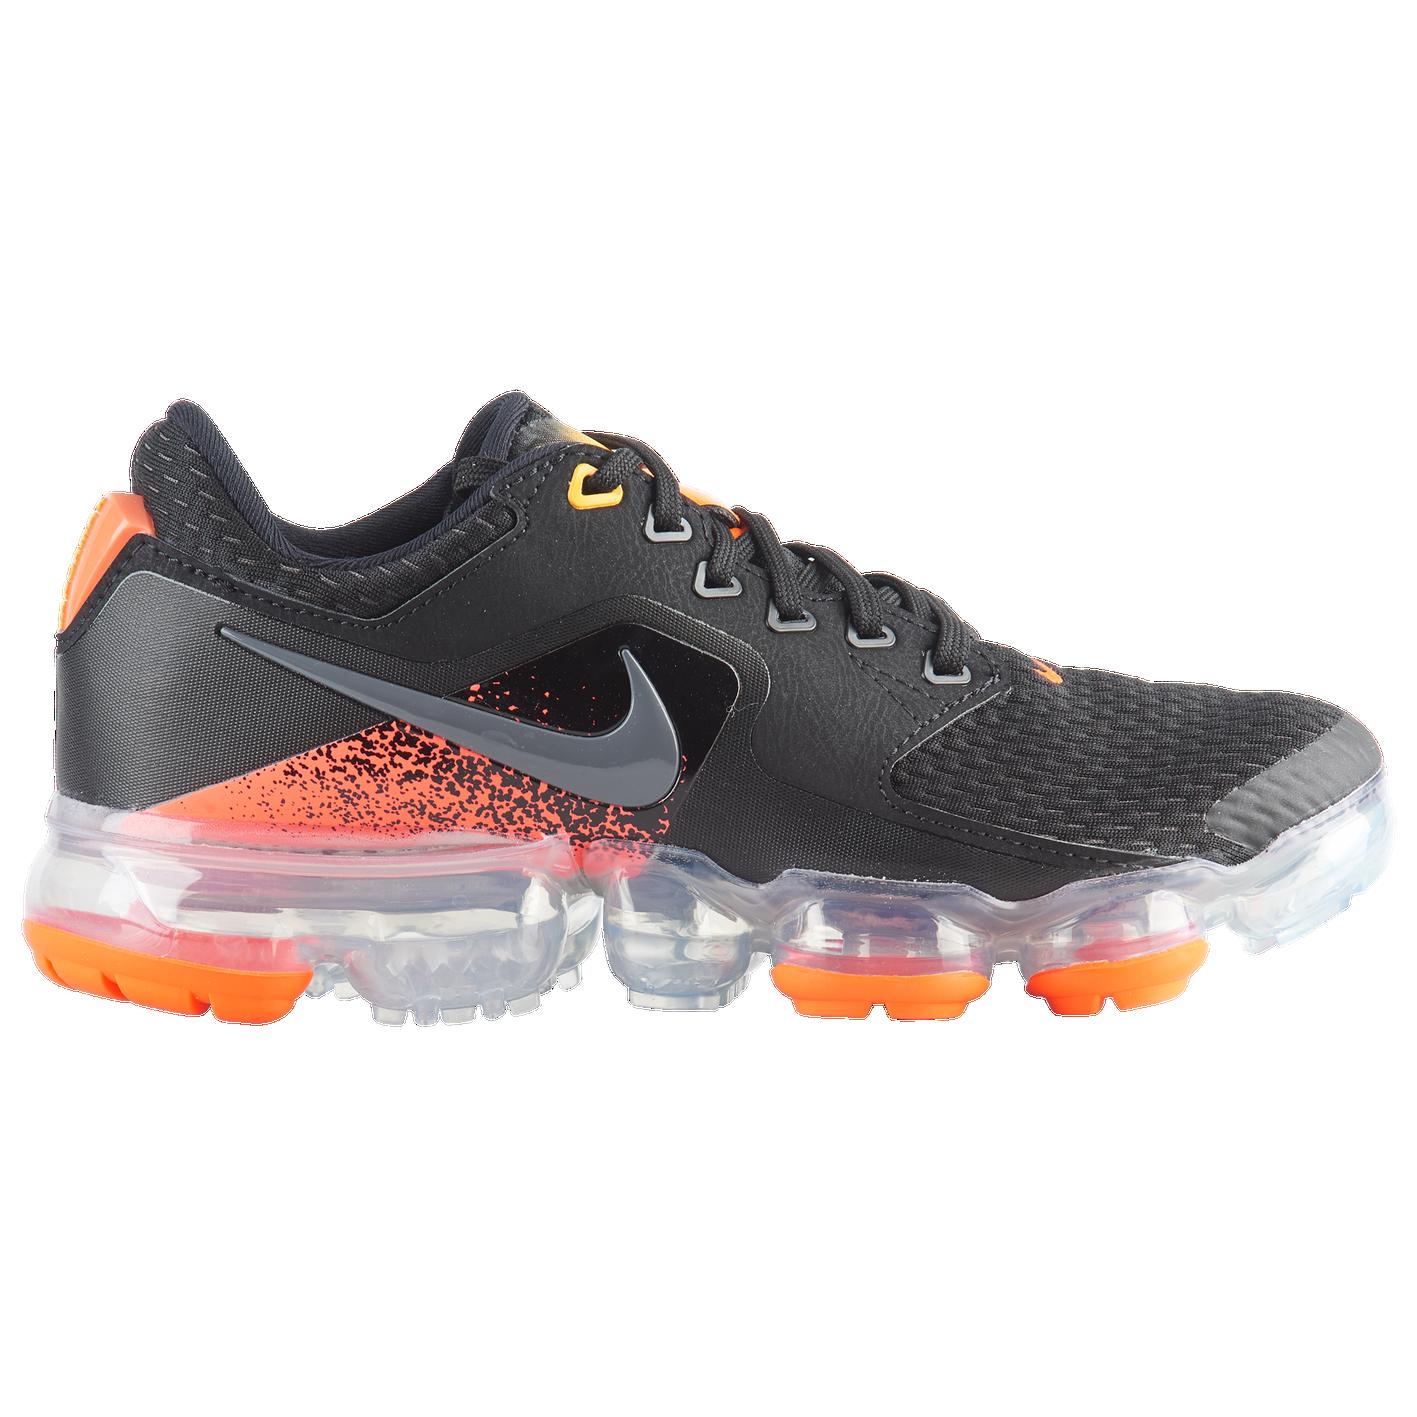 ced2b49d520 Nike VaporMax - Boys  Grade School - Casual - Shoes - Black Dark ...